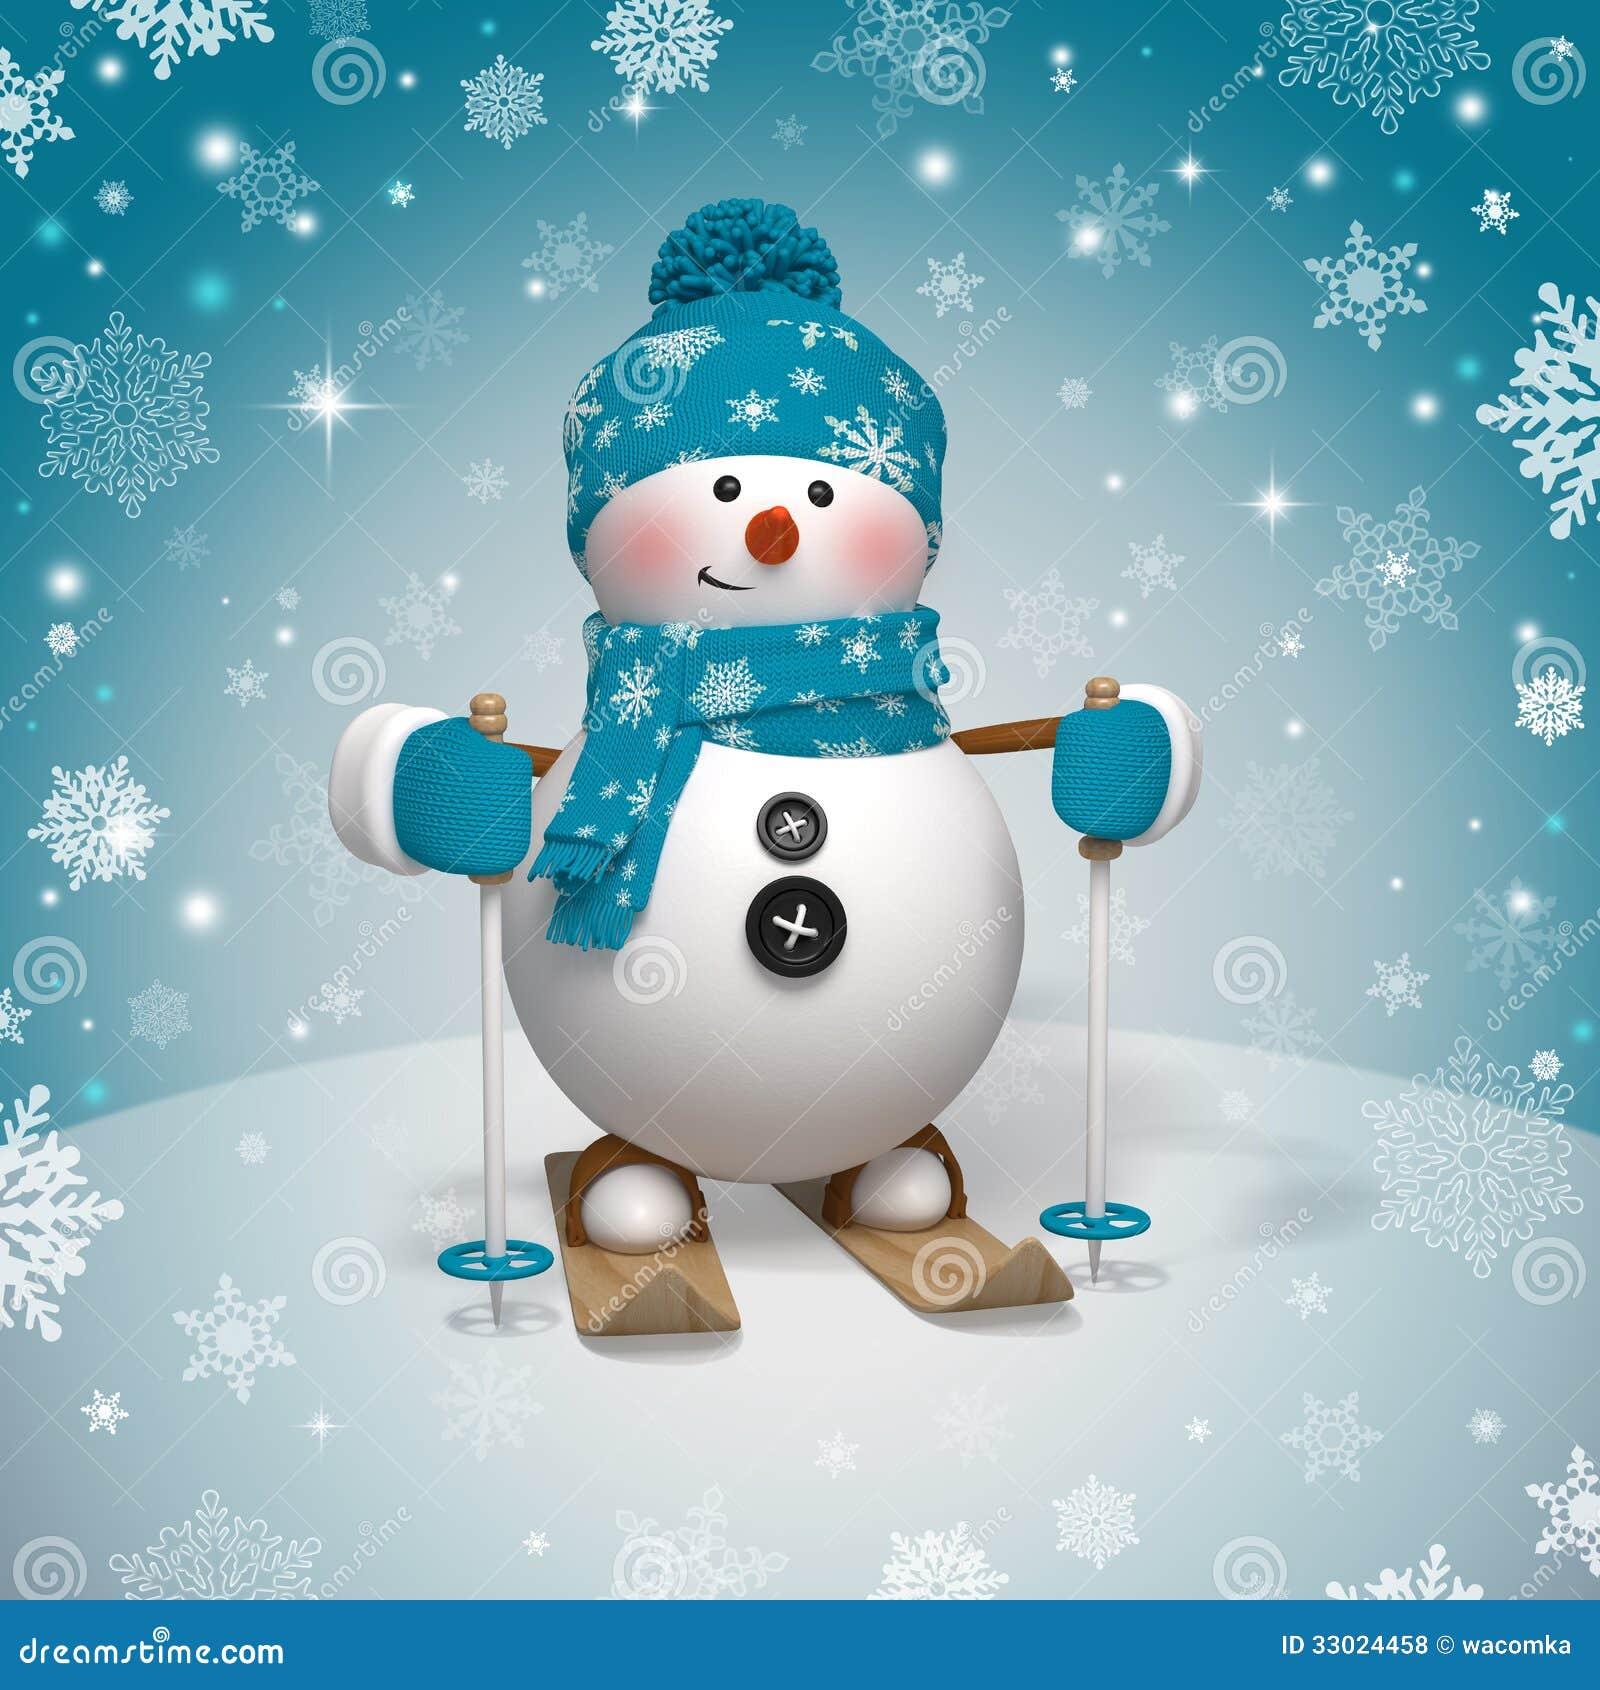 Cute funny Christmas skiing snowman